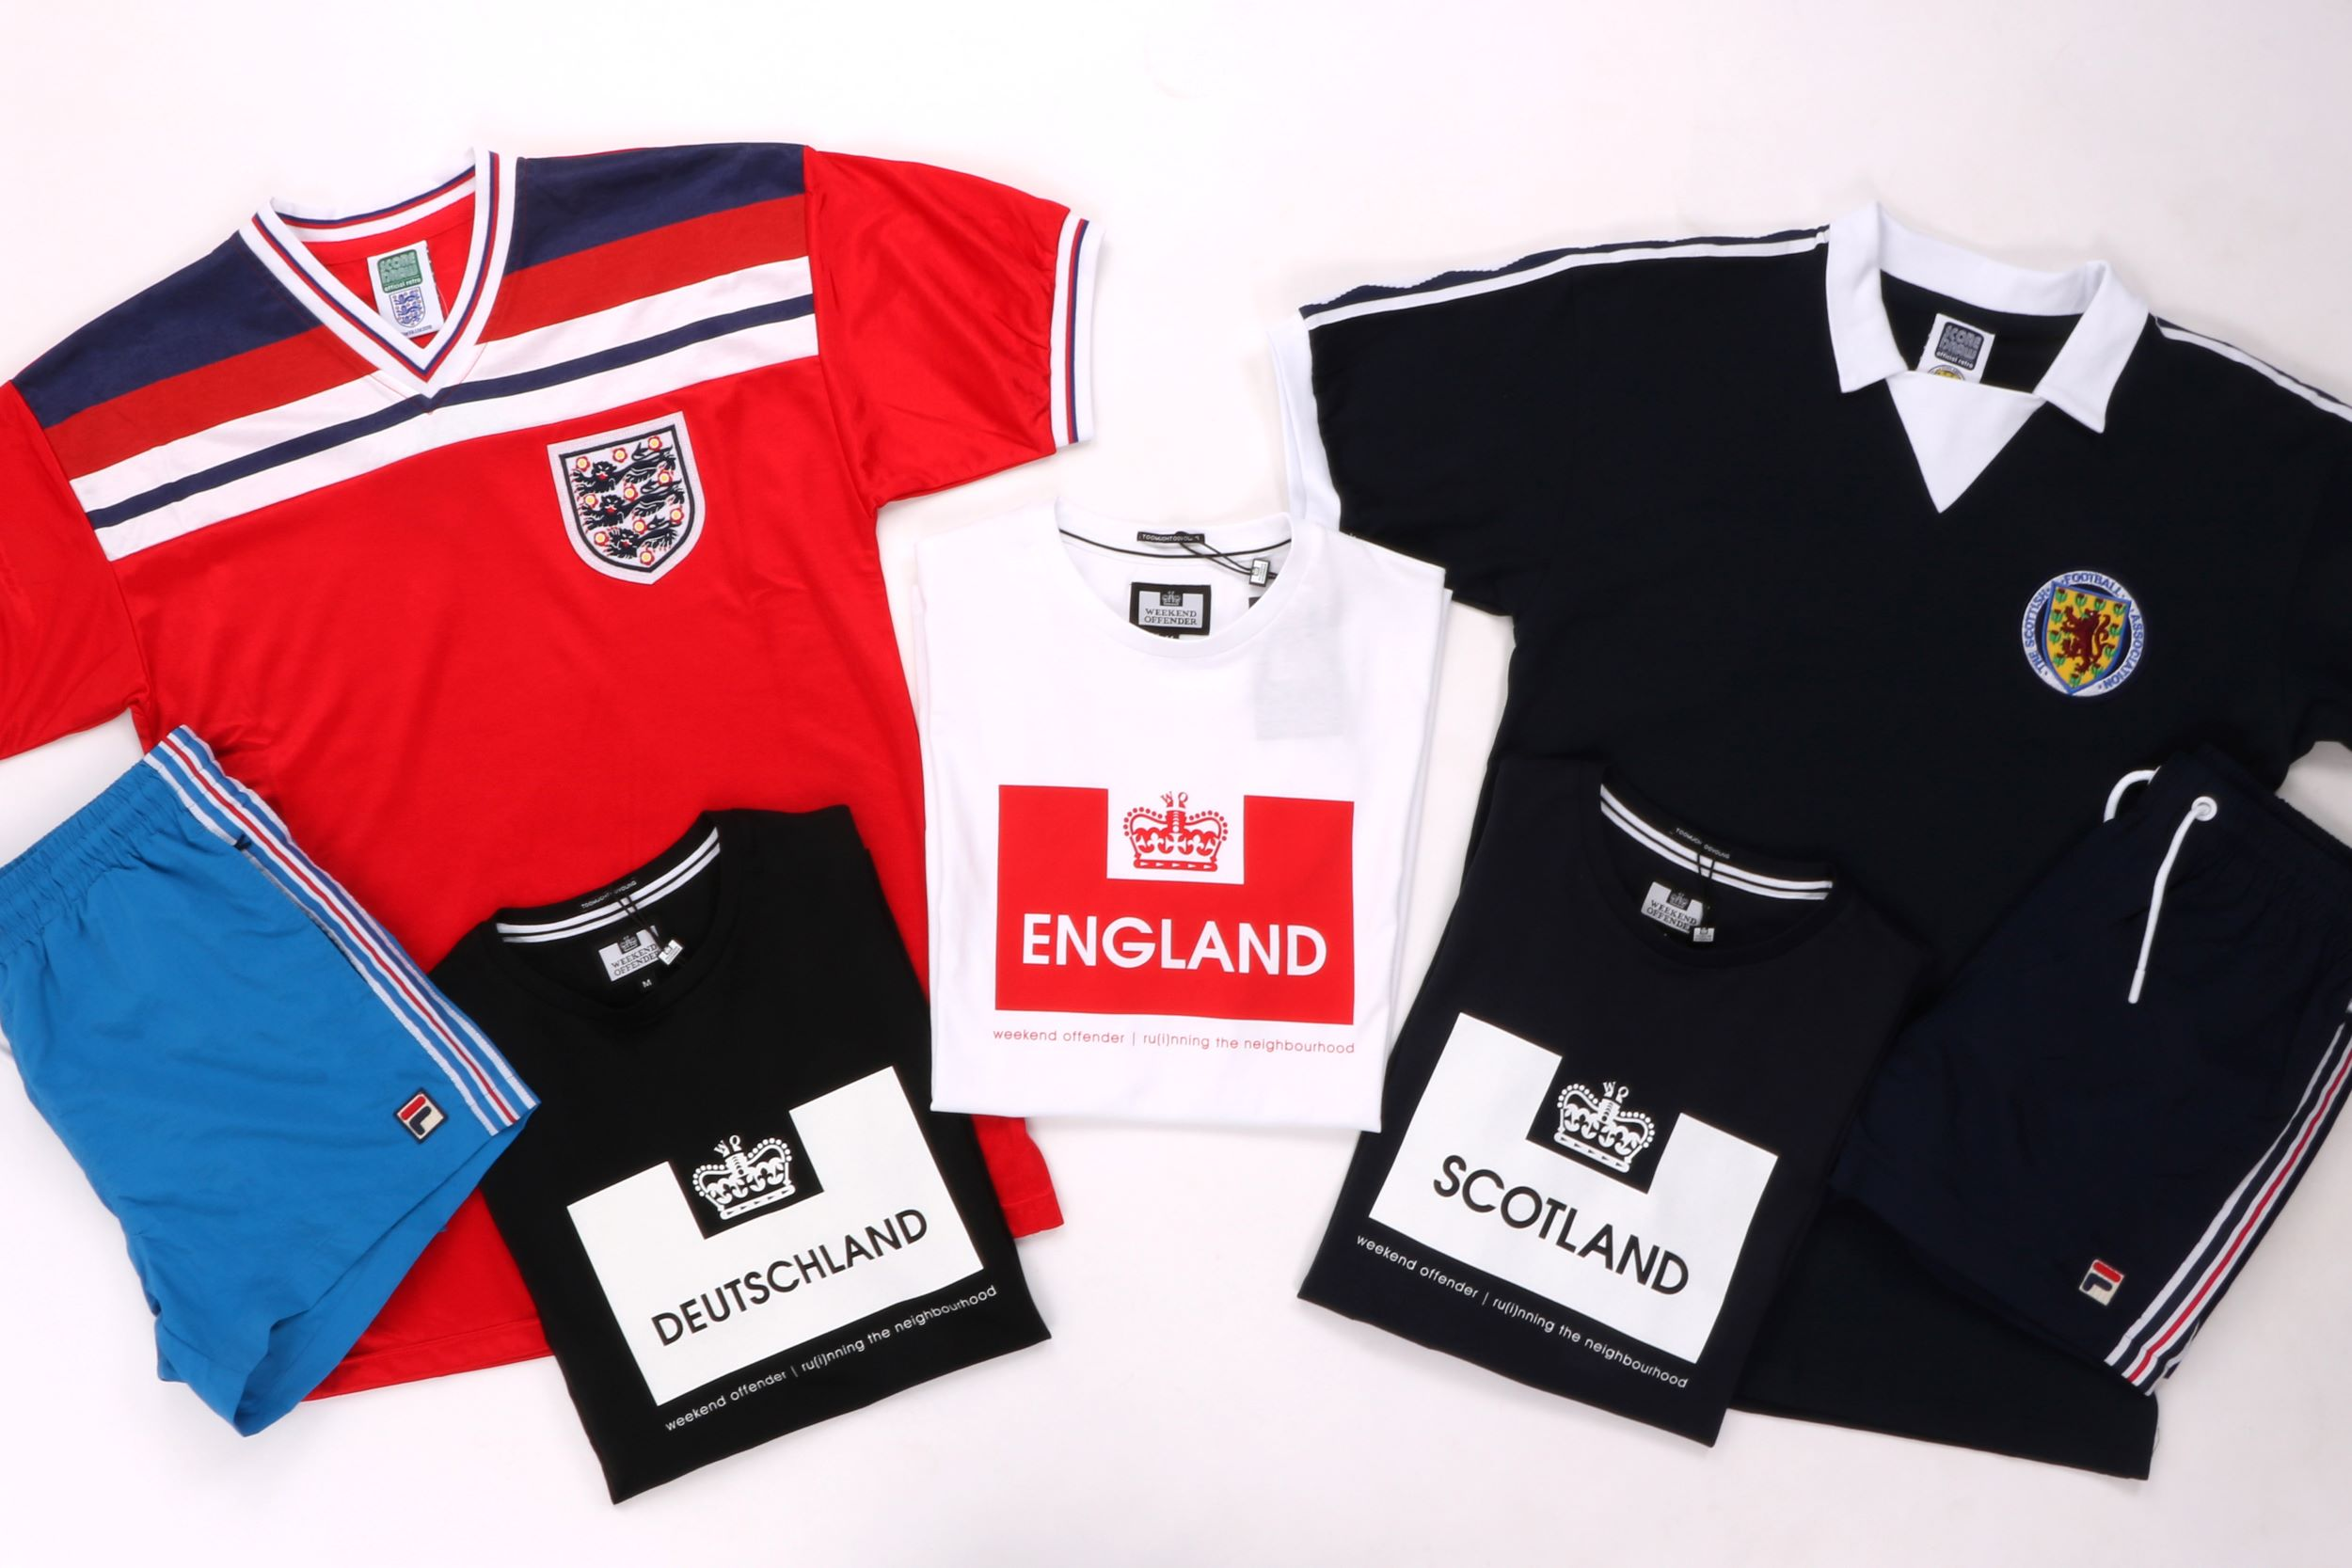 Scotland 1978 Home Football Shirt